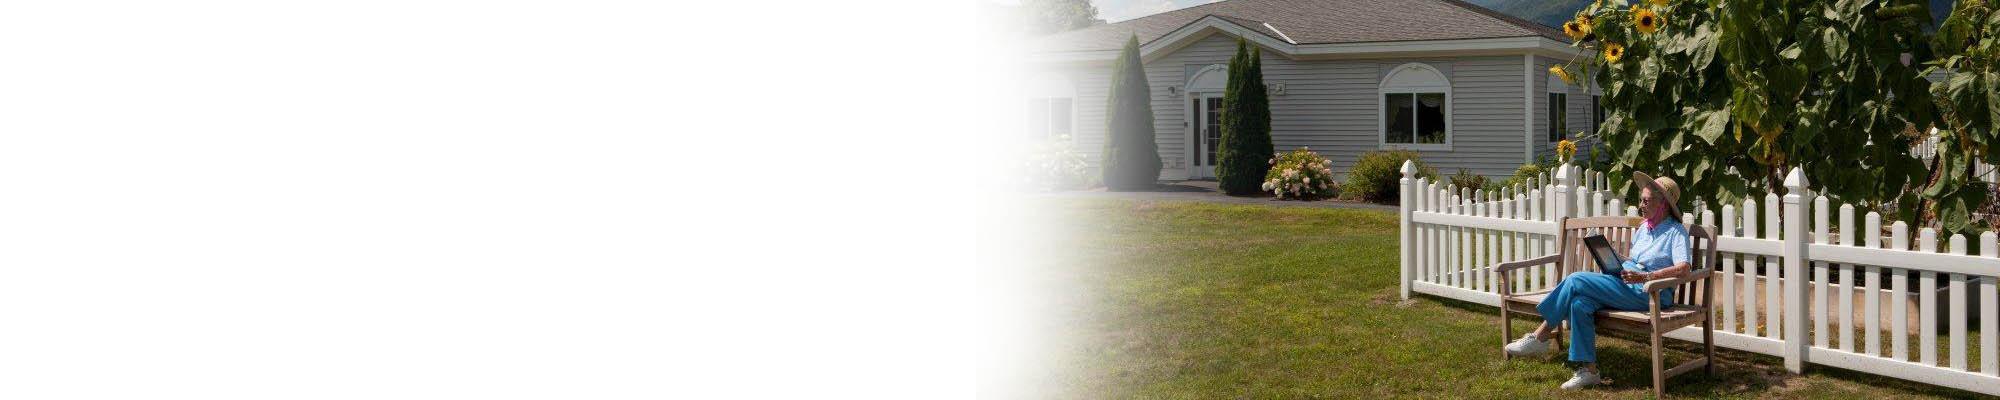 Testimonials for Equinox Terrace in Manchester Center, Vermont